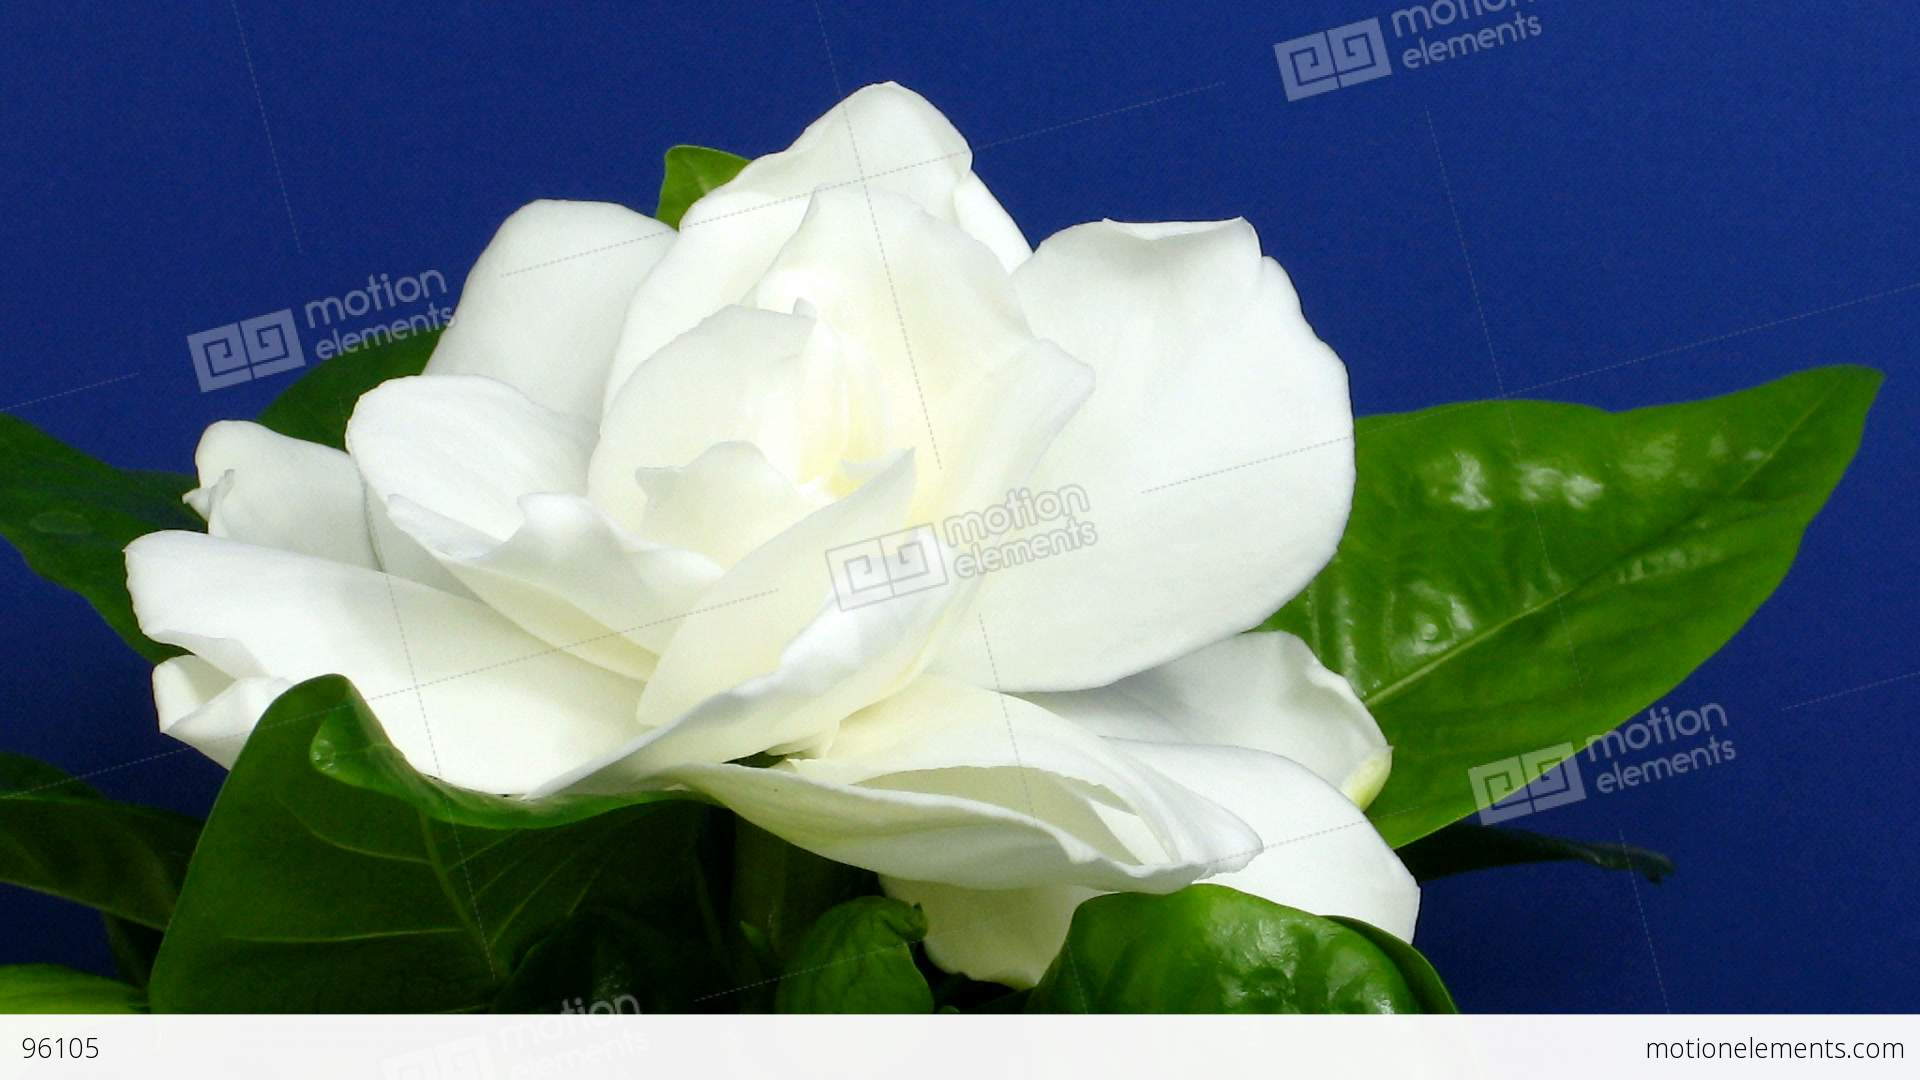 Time lapse of gardenia flower opening 2 stock video footage 96105 time lapse of gardenia flower opening 2 stock video footage mightylinksfo